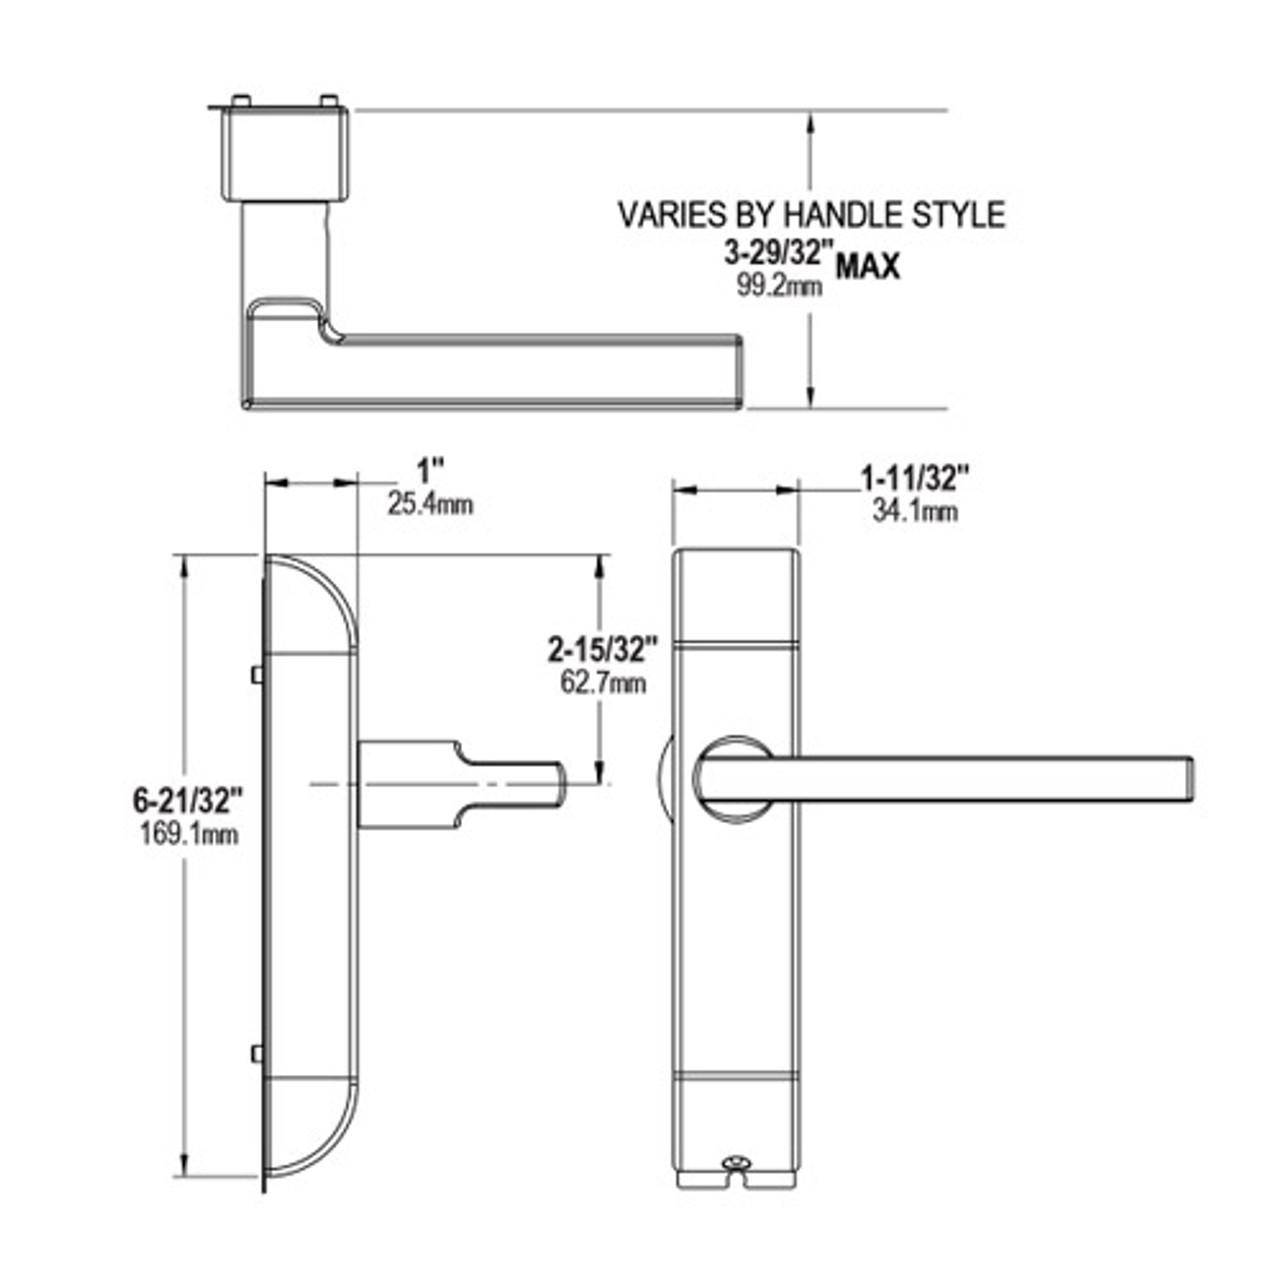 4600-MD-531-US32 Adams Rite MD Designer handle Dimensional View